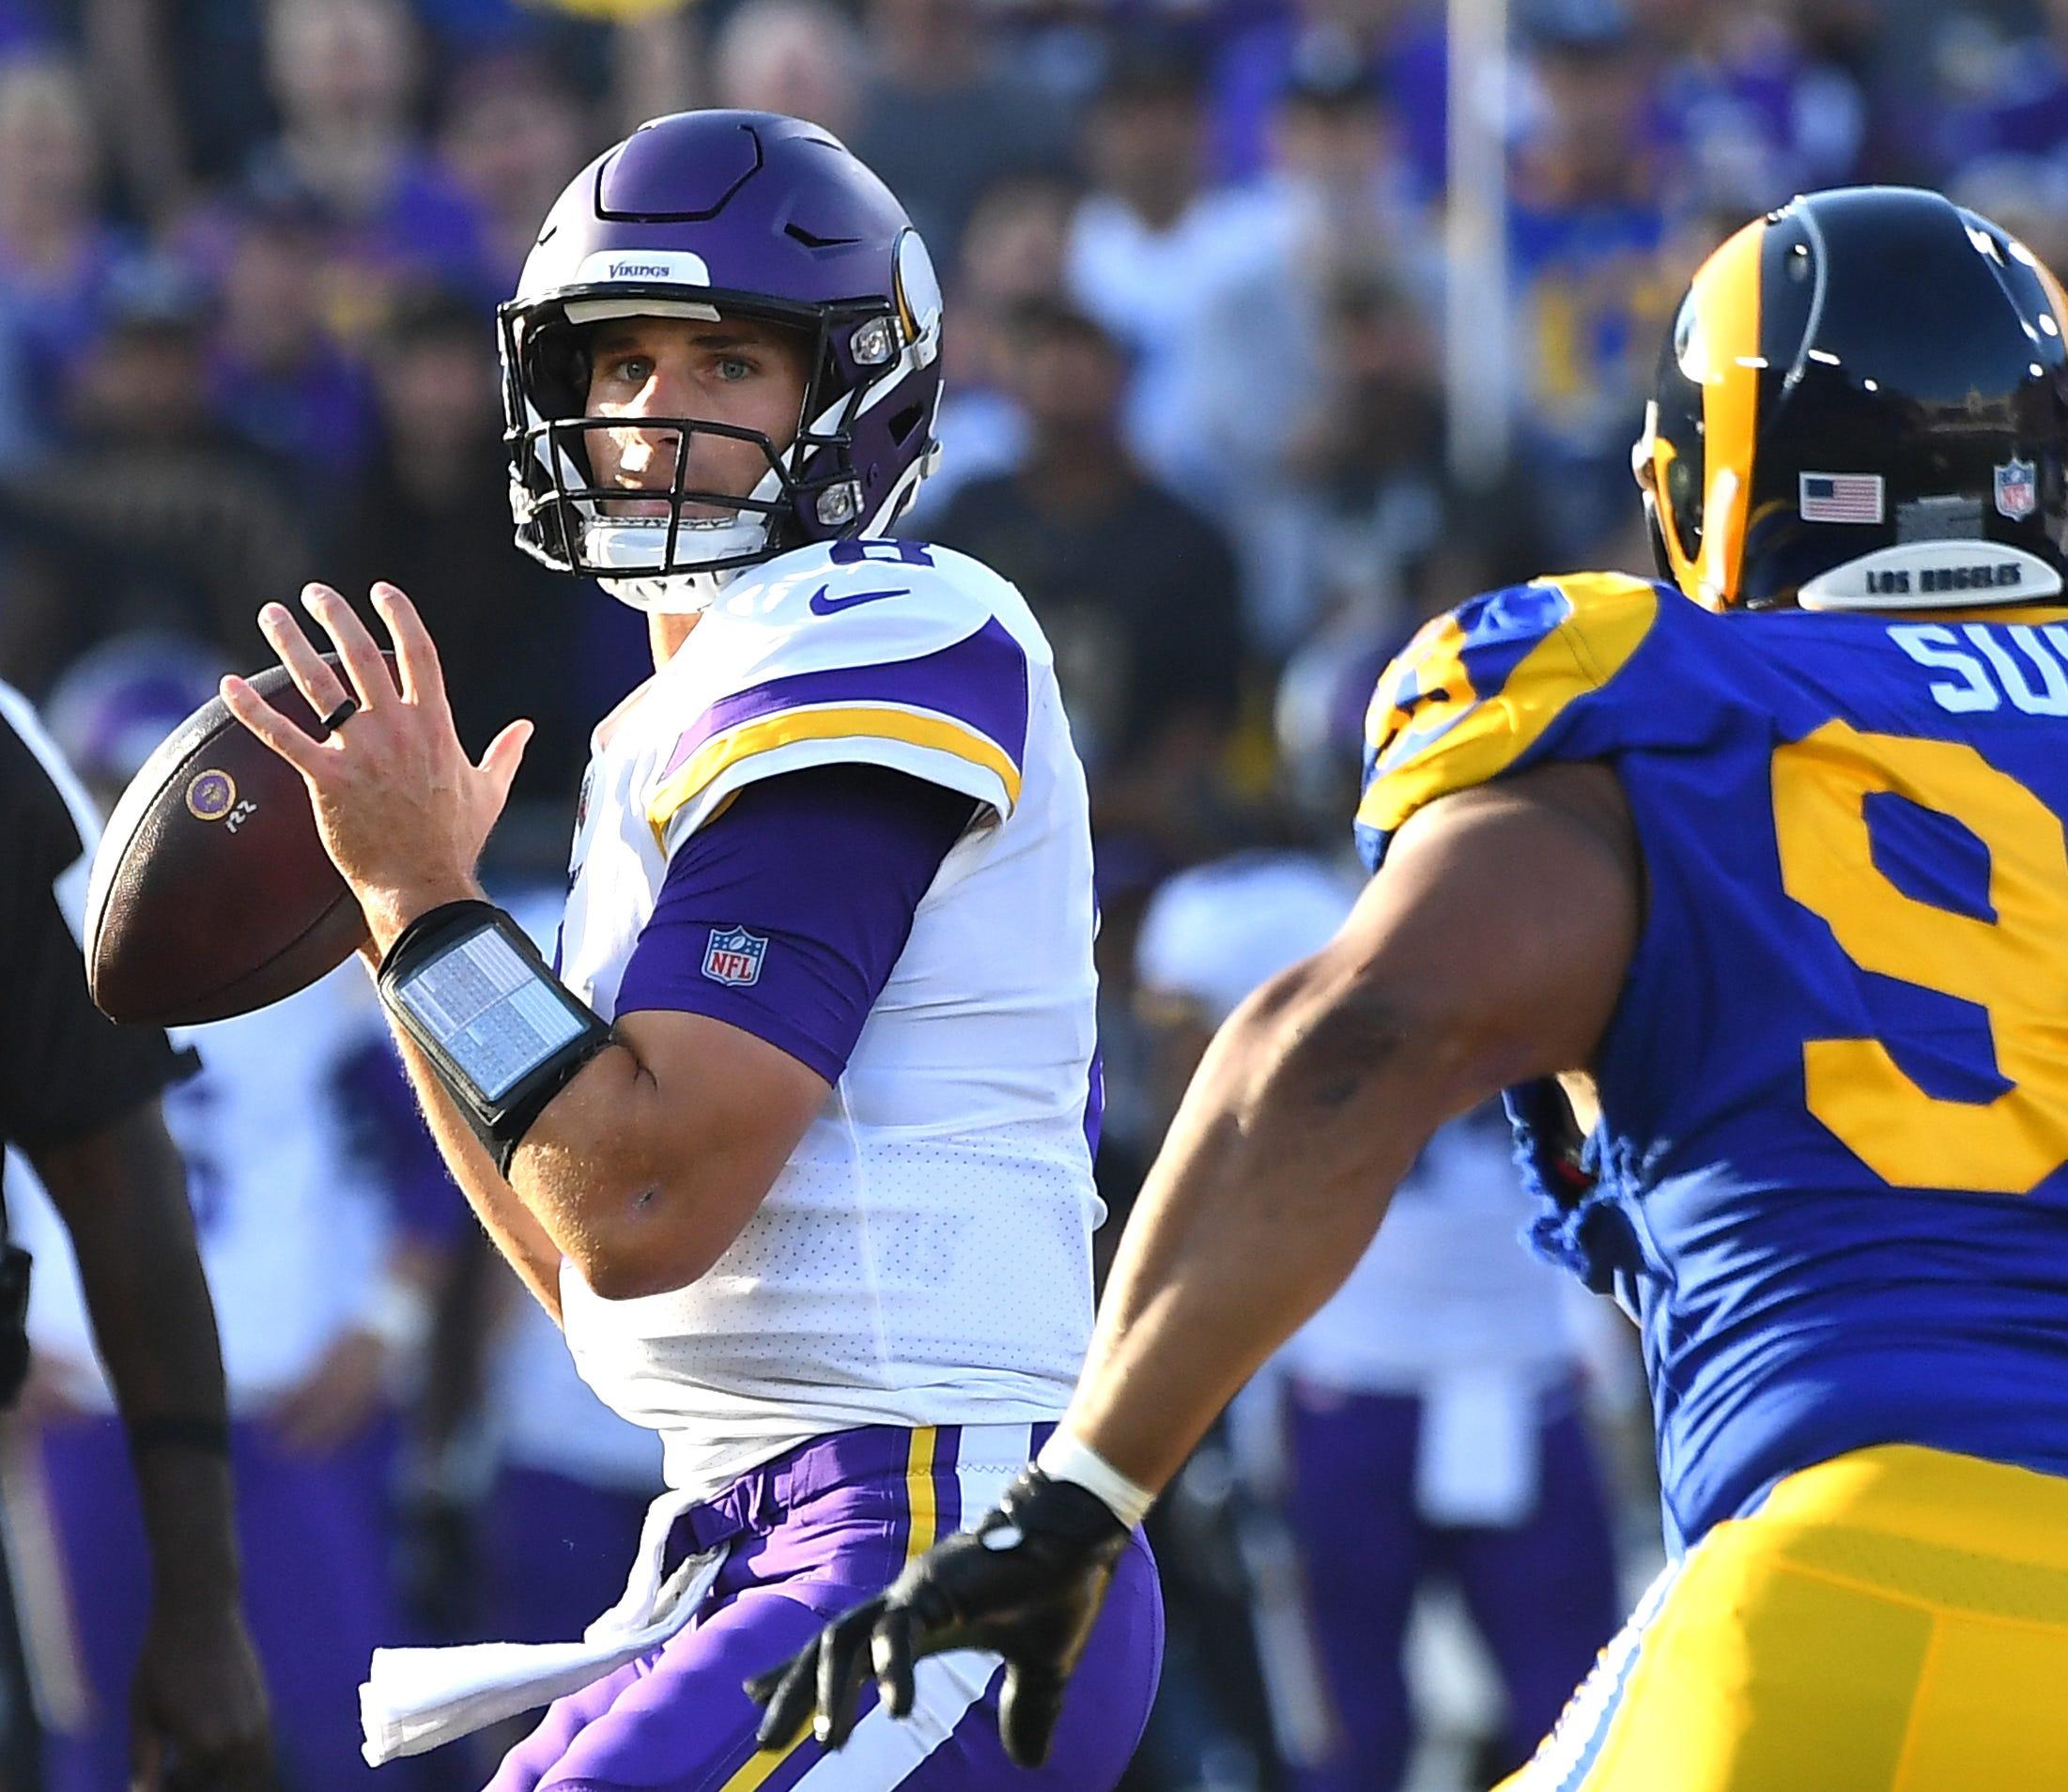 Nfl Minnesota Vikings At Los Angeles Rams